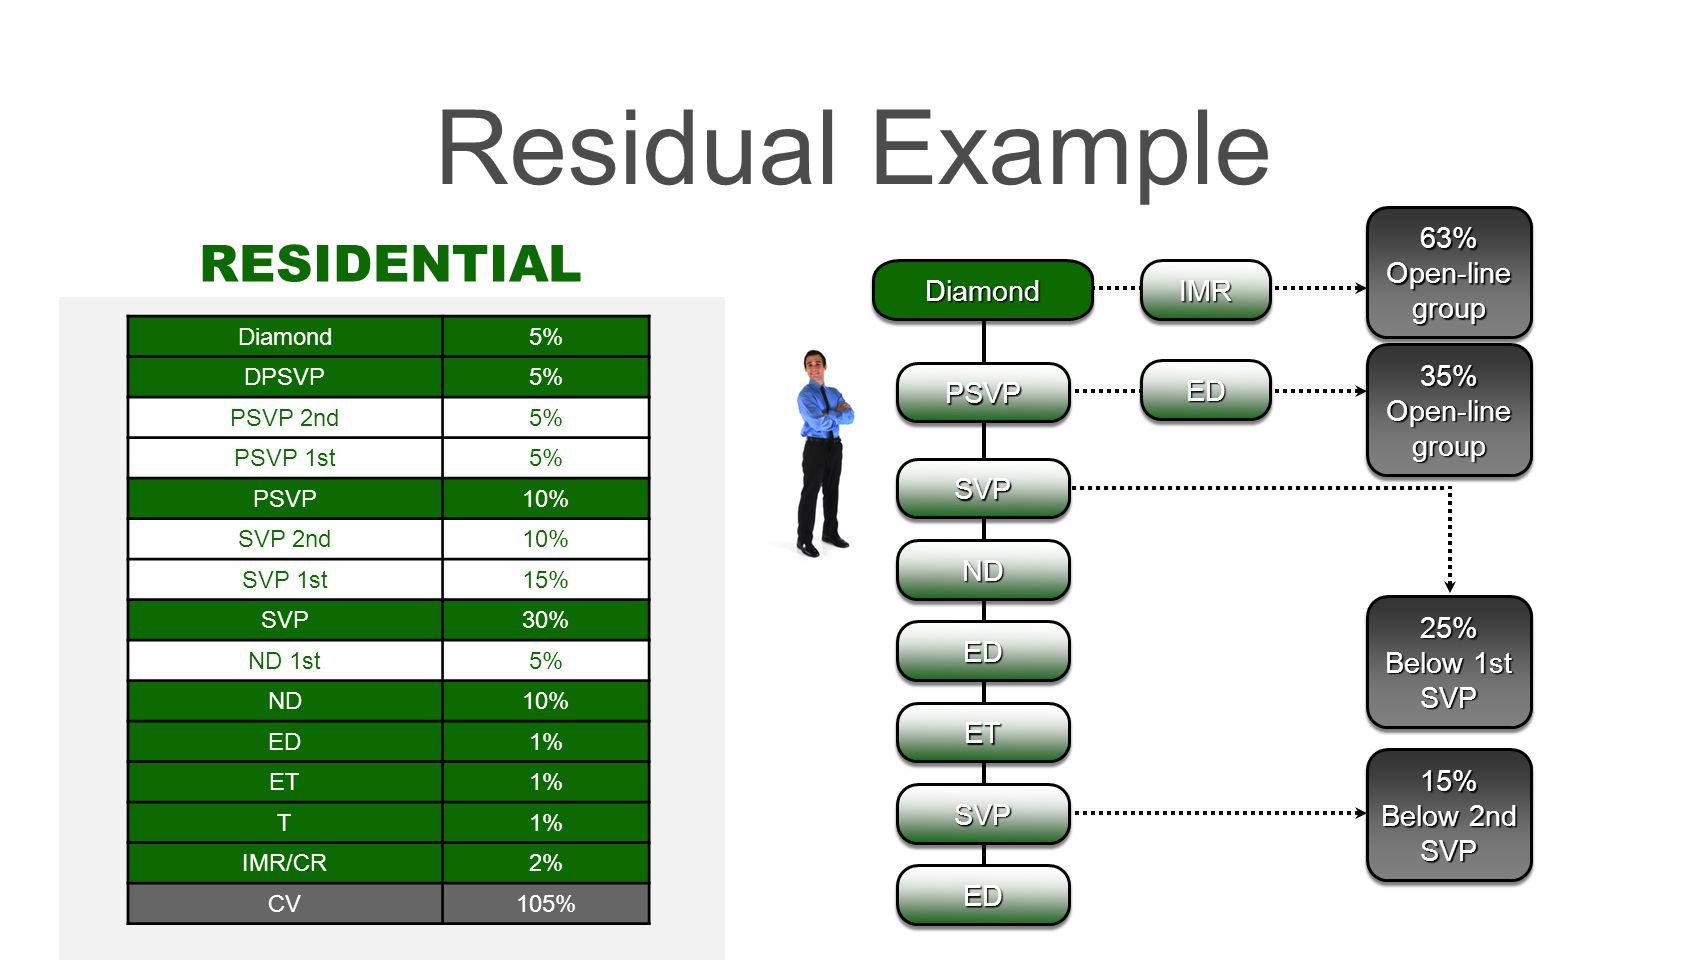 15% Below 2nd SVP15% SVP EDED 35% Open-line group 35% IMRIMR 63% 63% 25% Below 1st SVP 25% Residual Example Diamond5% DPSVP5% PSVP 2nd5% PSVP 1st5% PSVP10% SVP 2nd10% SVP 1st15% SVP30% ND 1st5% ND10% ED1% ET1% T IMR/CR2% CV105% RESIDENTIAL DiamondDiamond NDND SVPSVP EDED ETET SVPSVP EDED PSVPPSVP